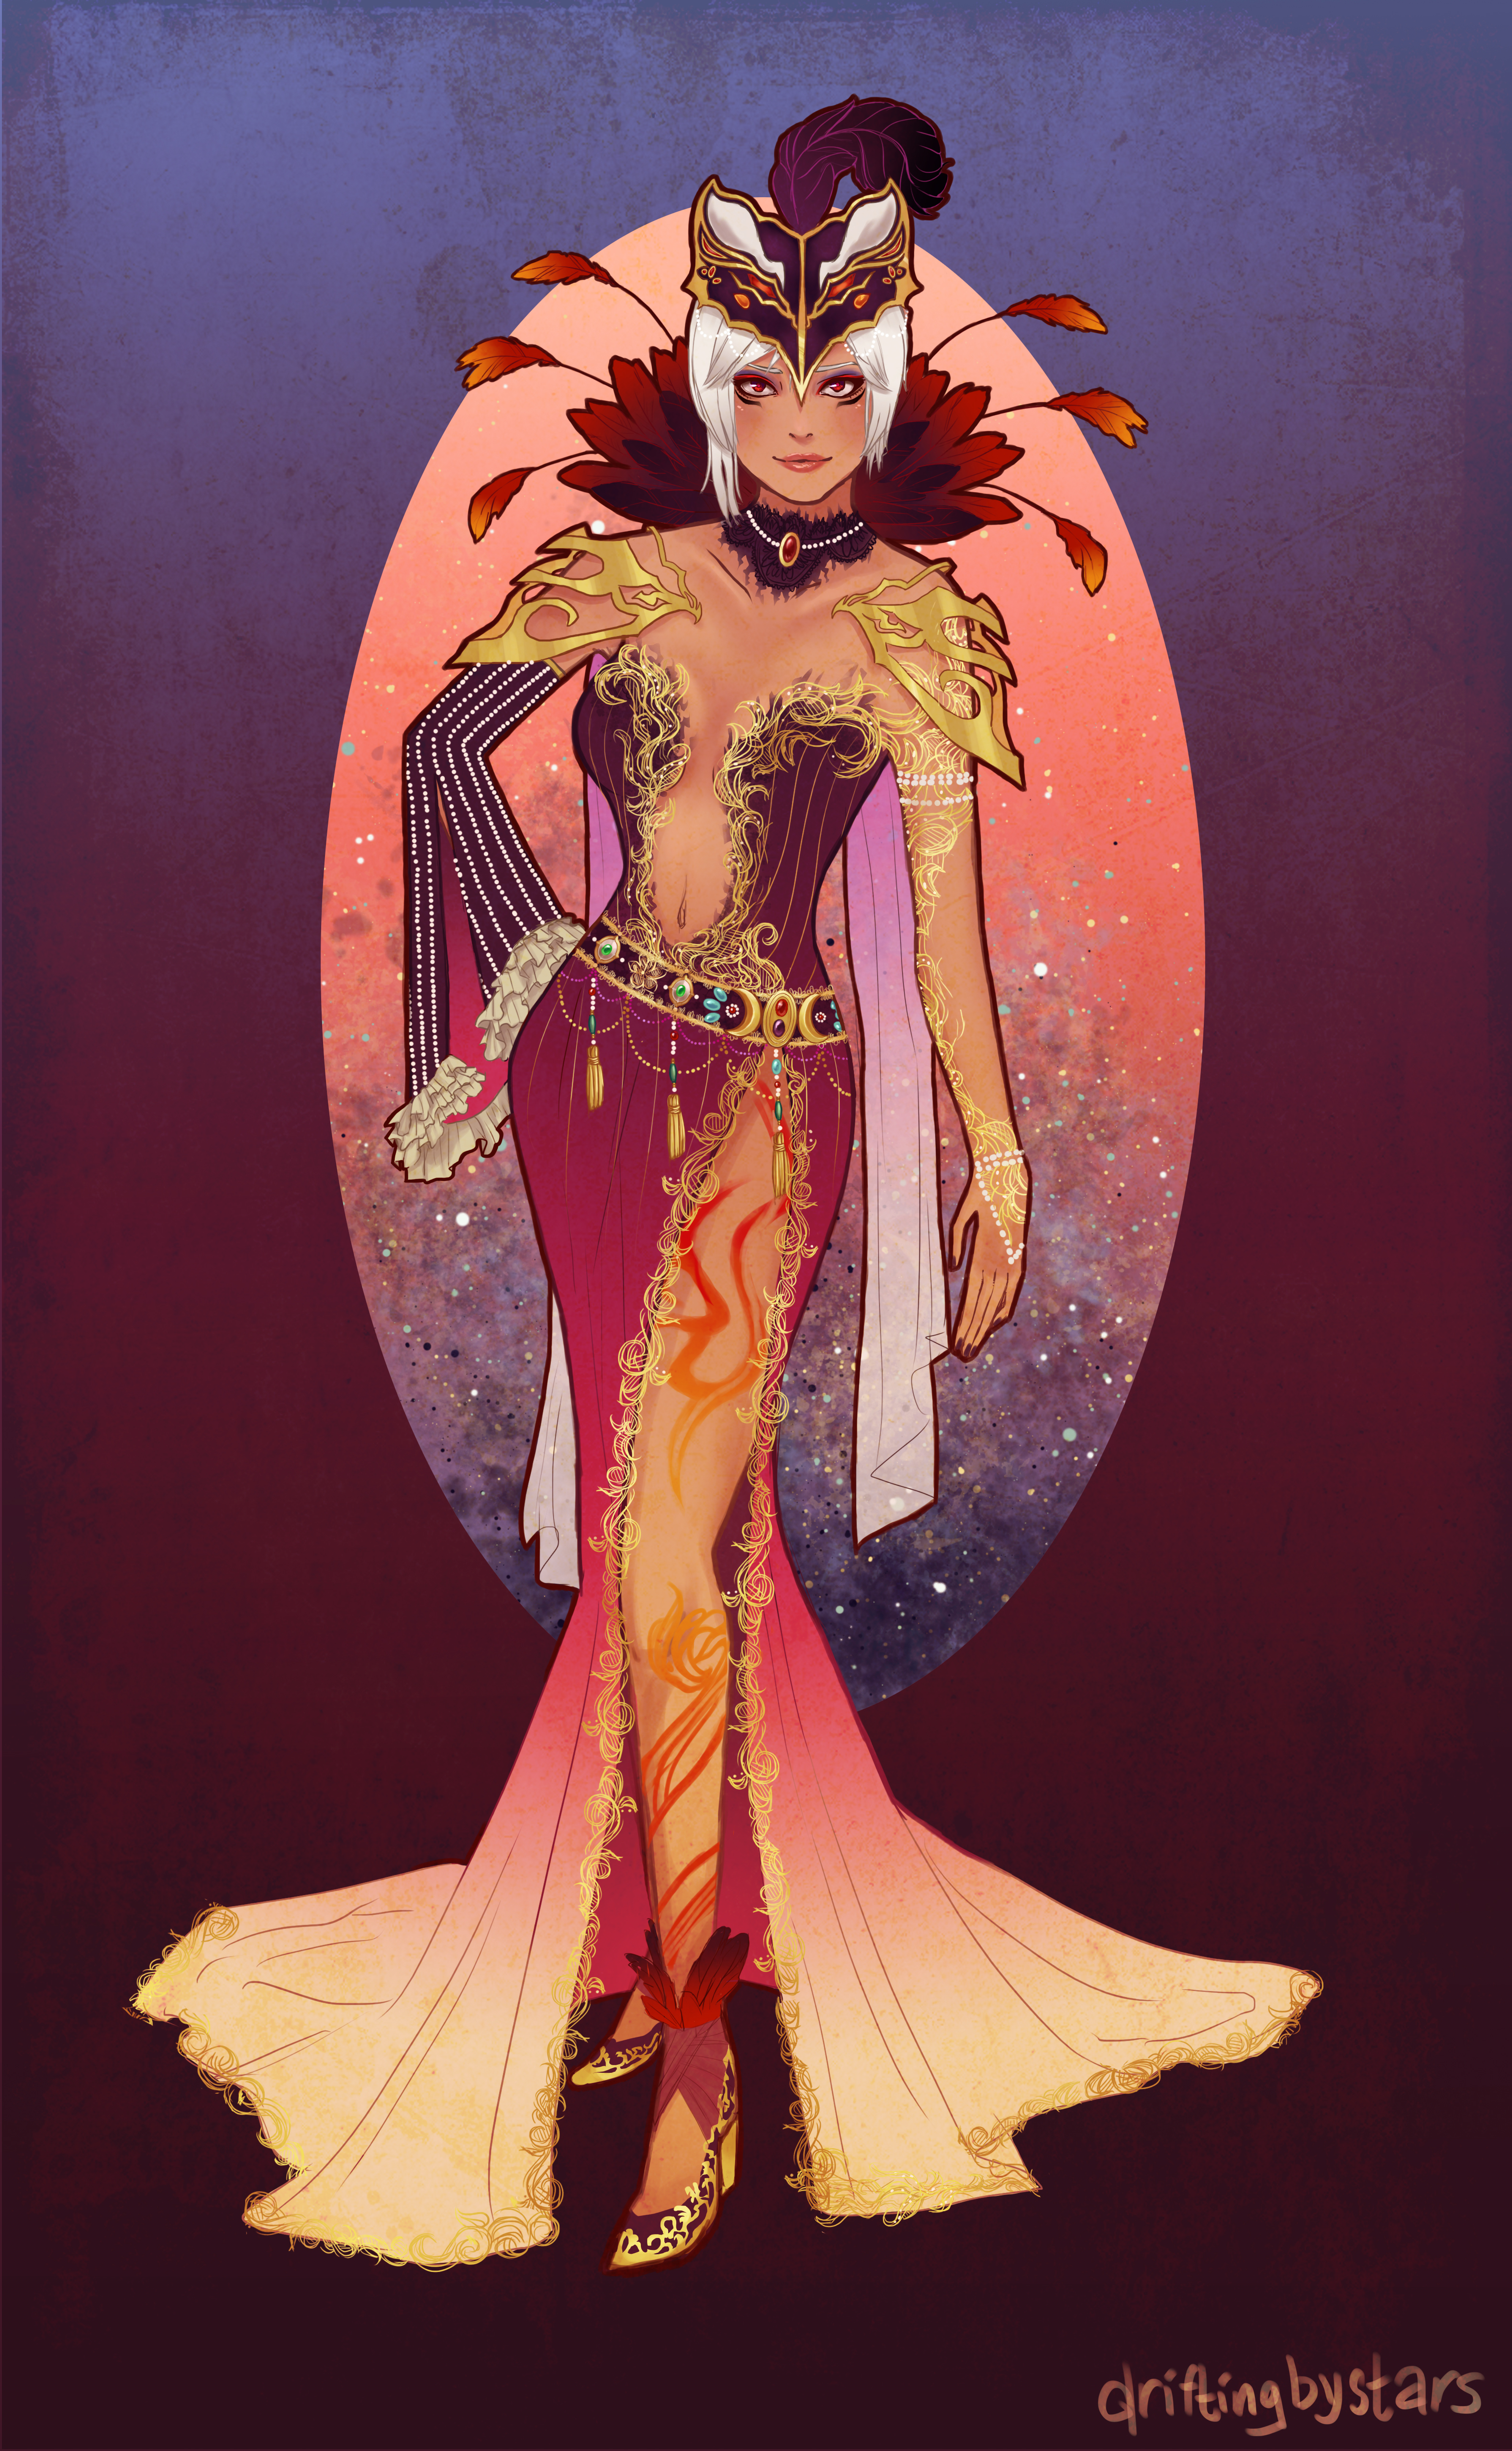 Hyrule Warriors Art Nouveau Cia By Aeternumluminis On Deviantart